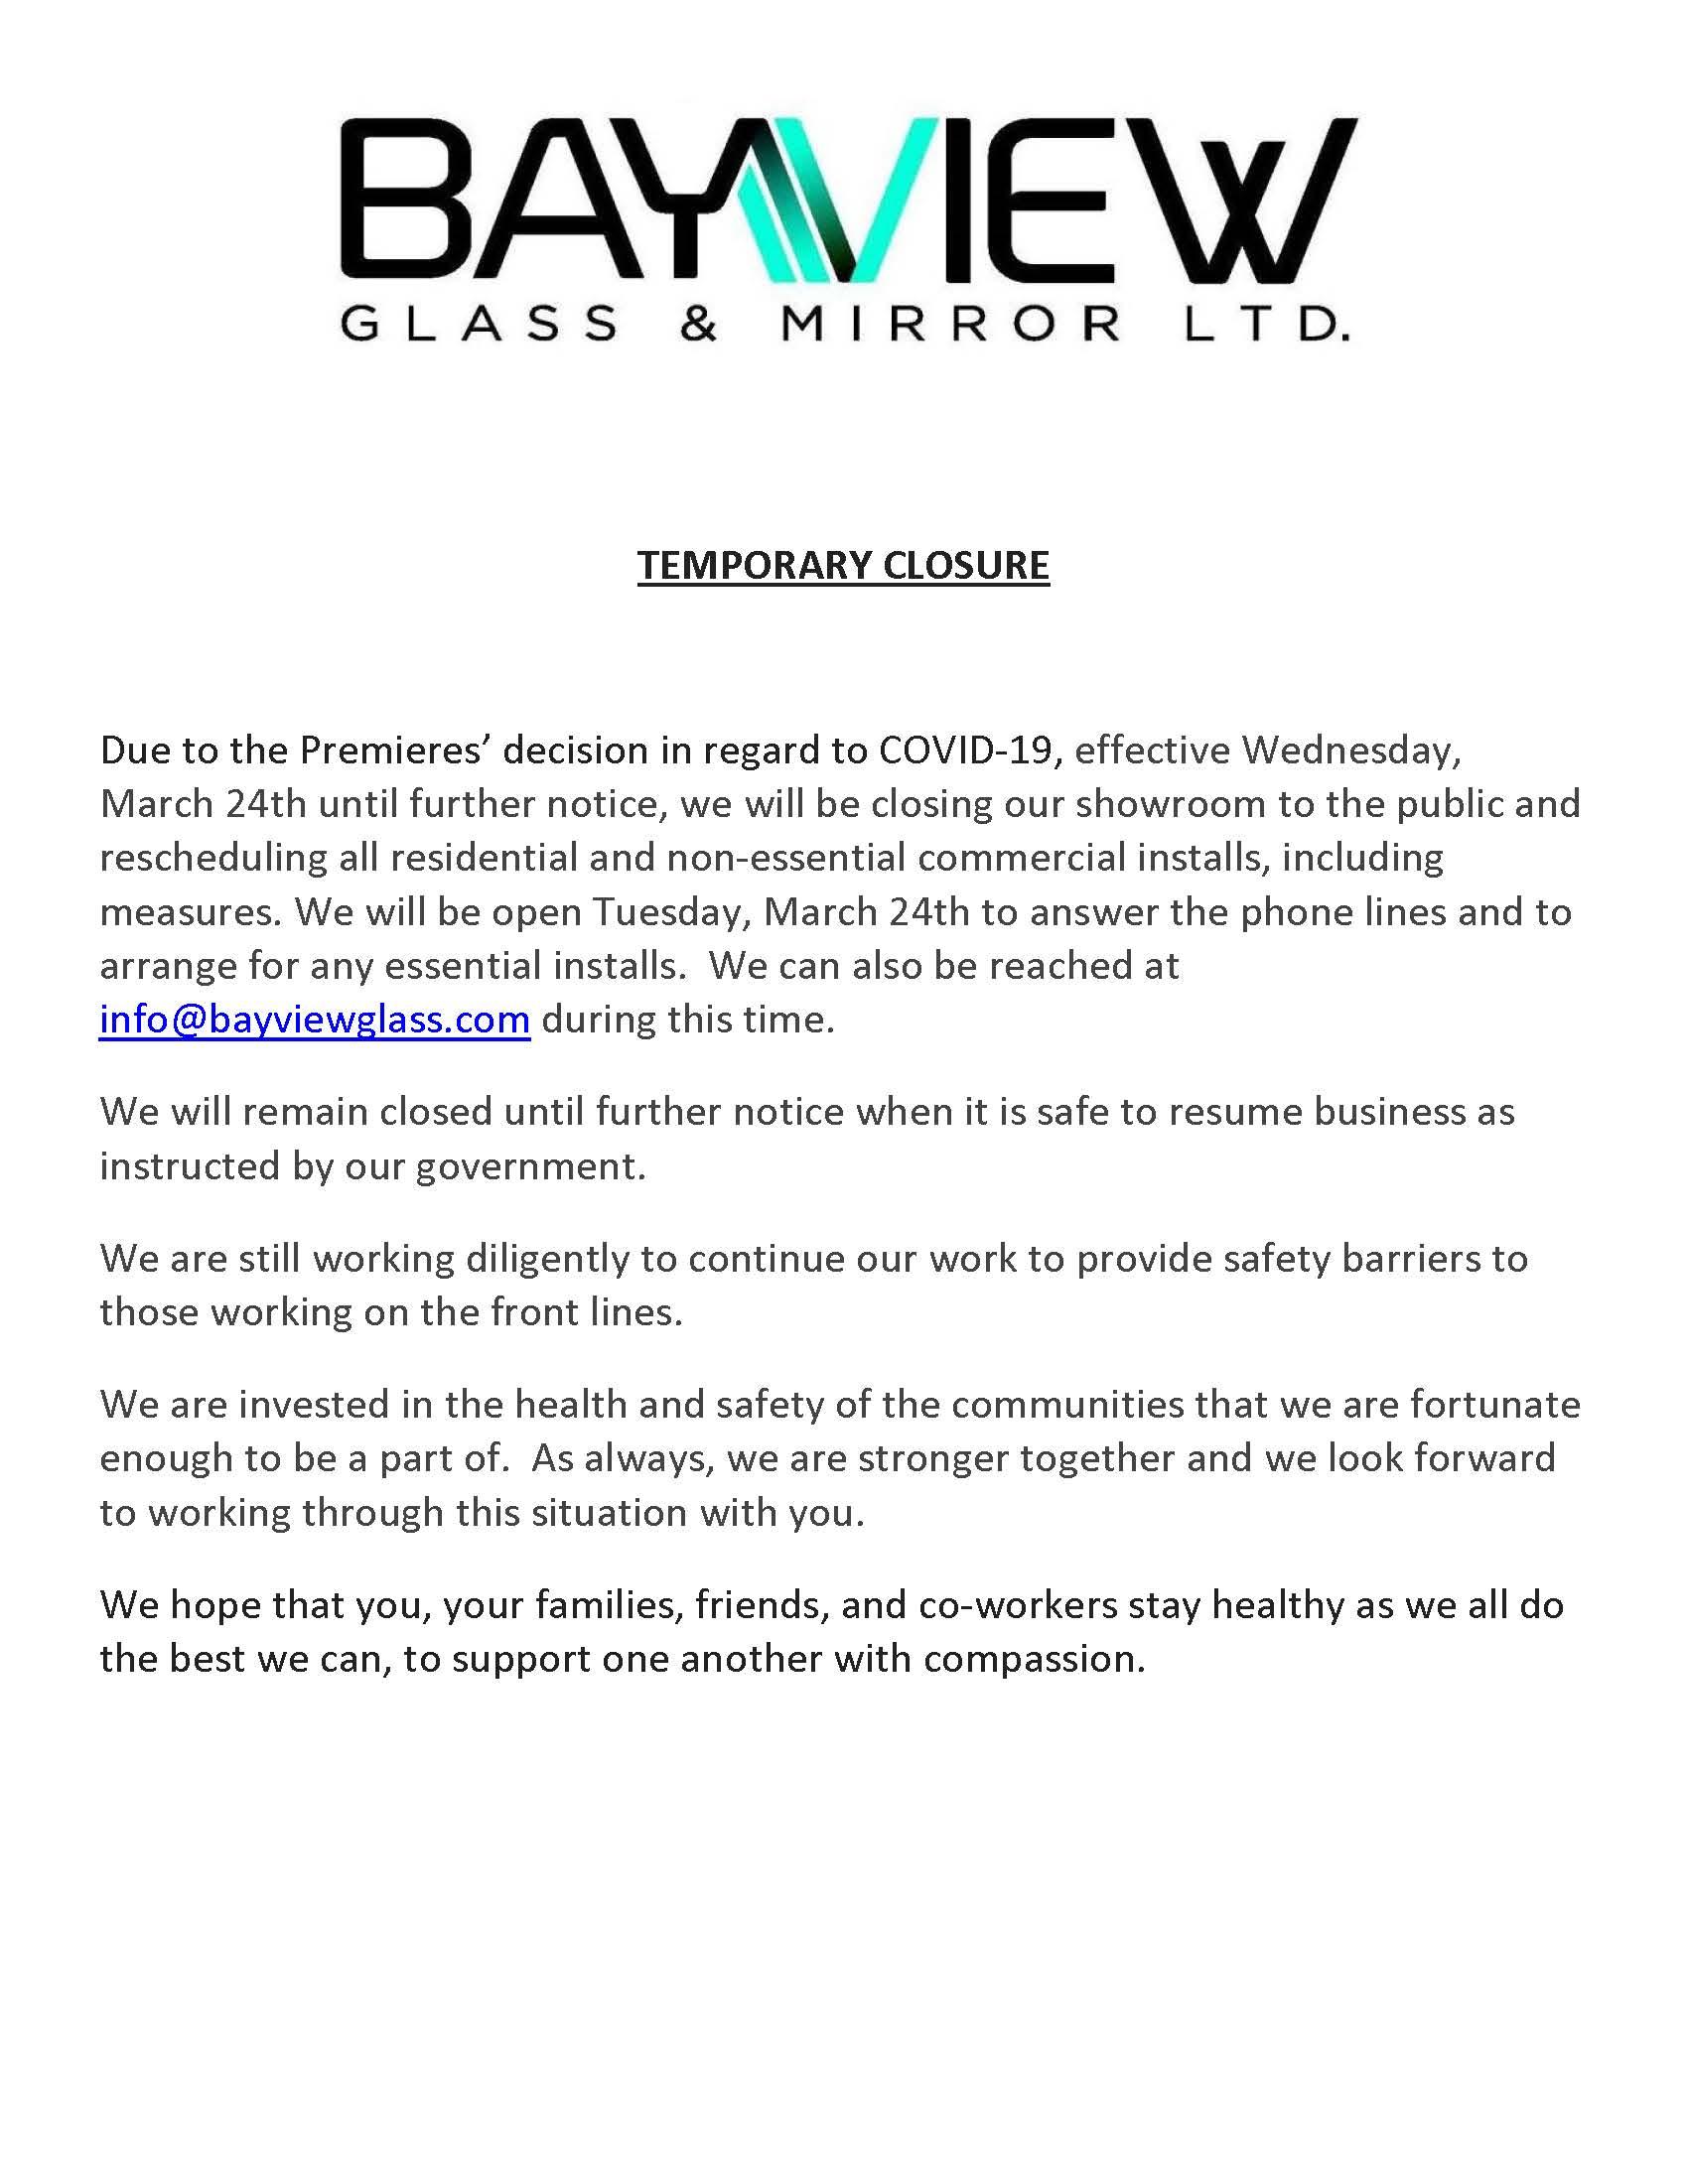 Covid Closure Letter March 24th JPEG